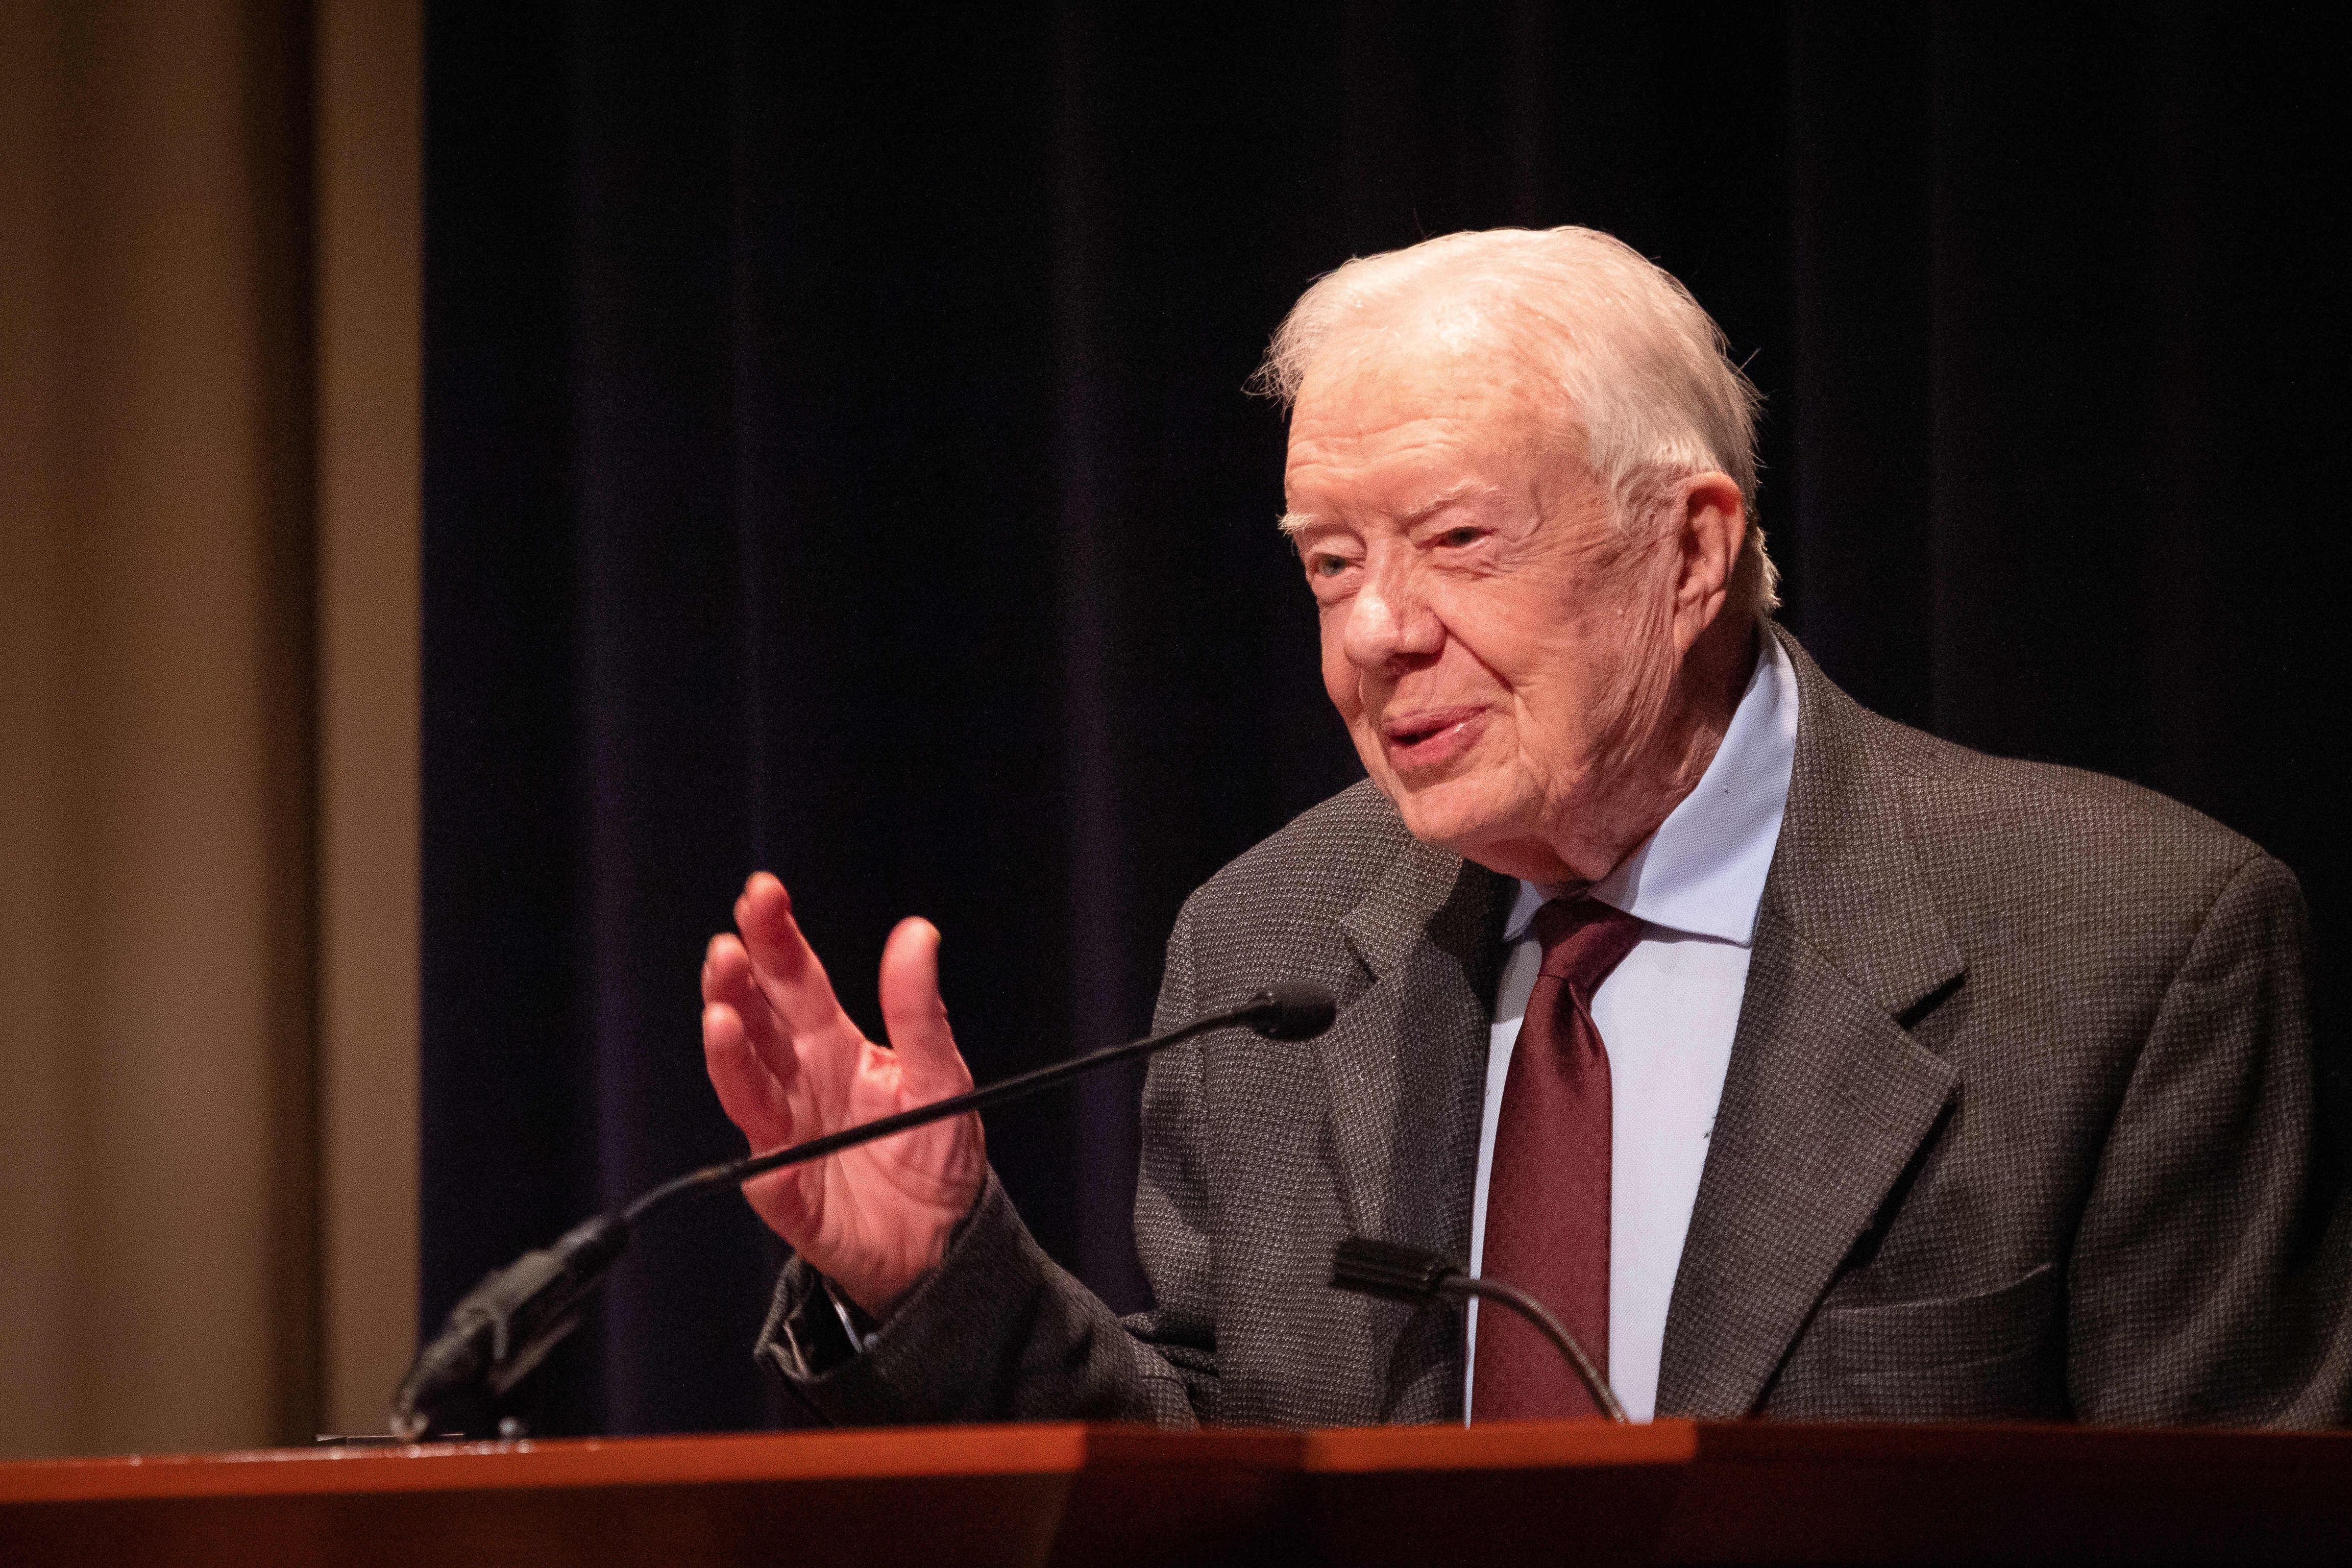 Jimmy Carter Wins 2019 Grammy Award For Spoken Word